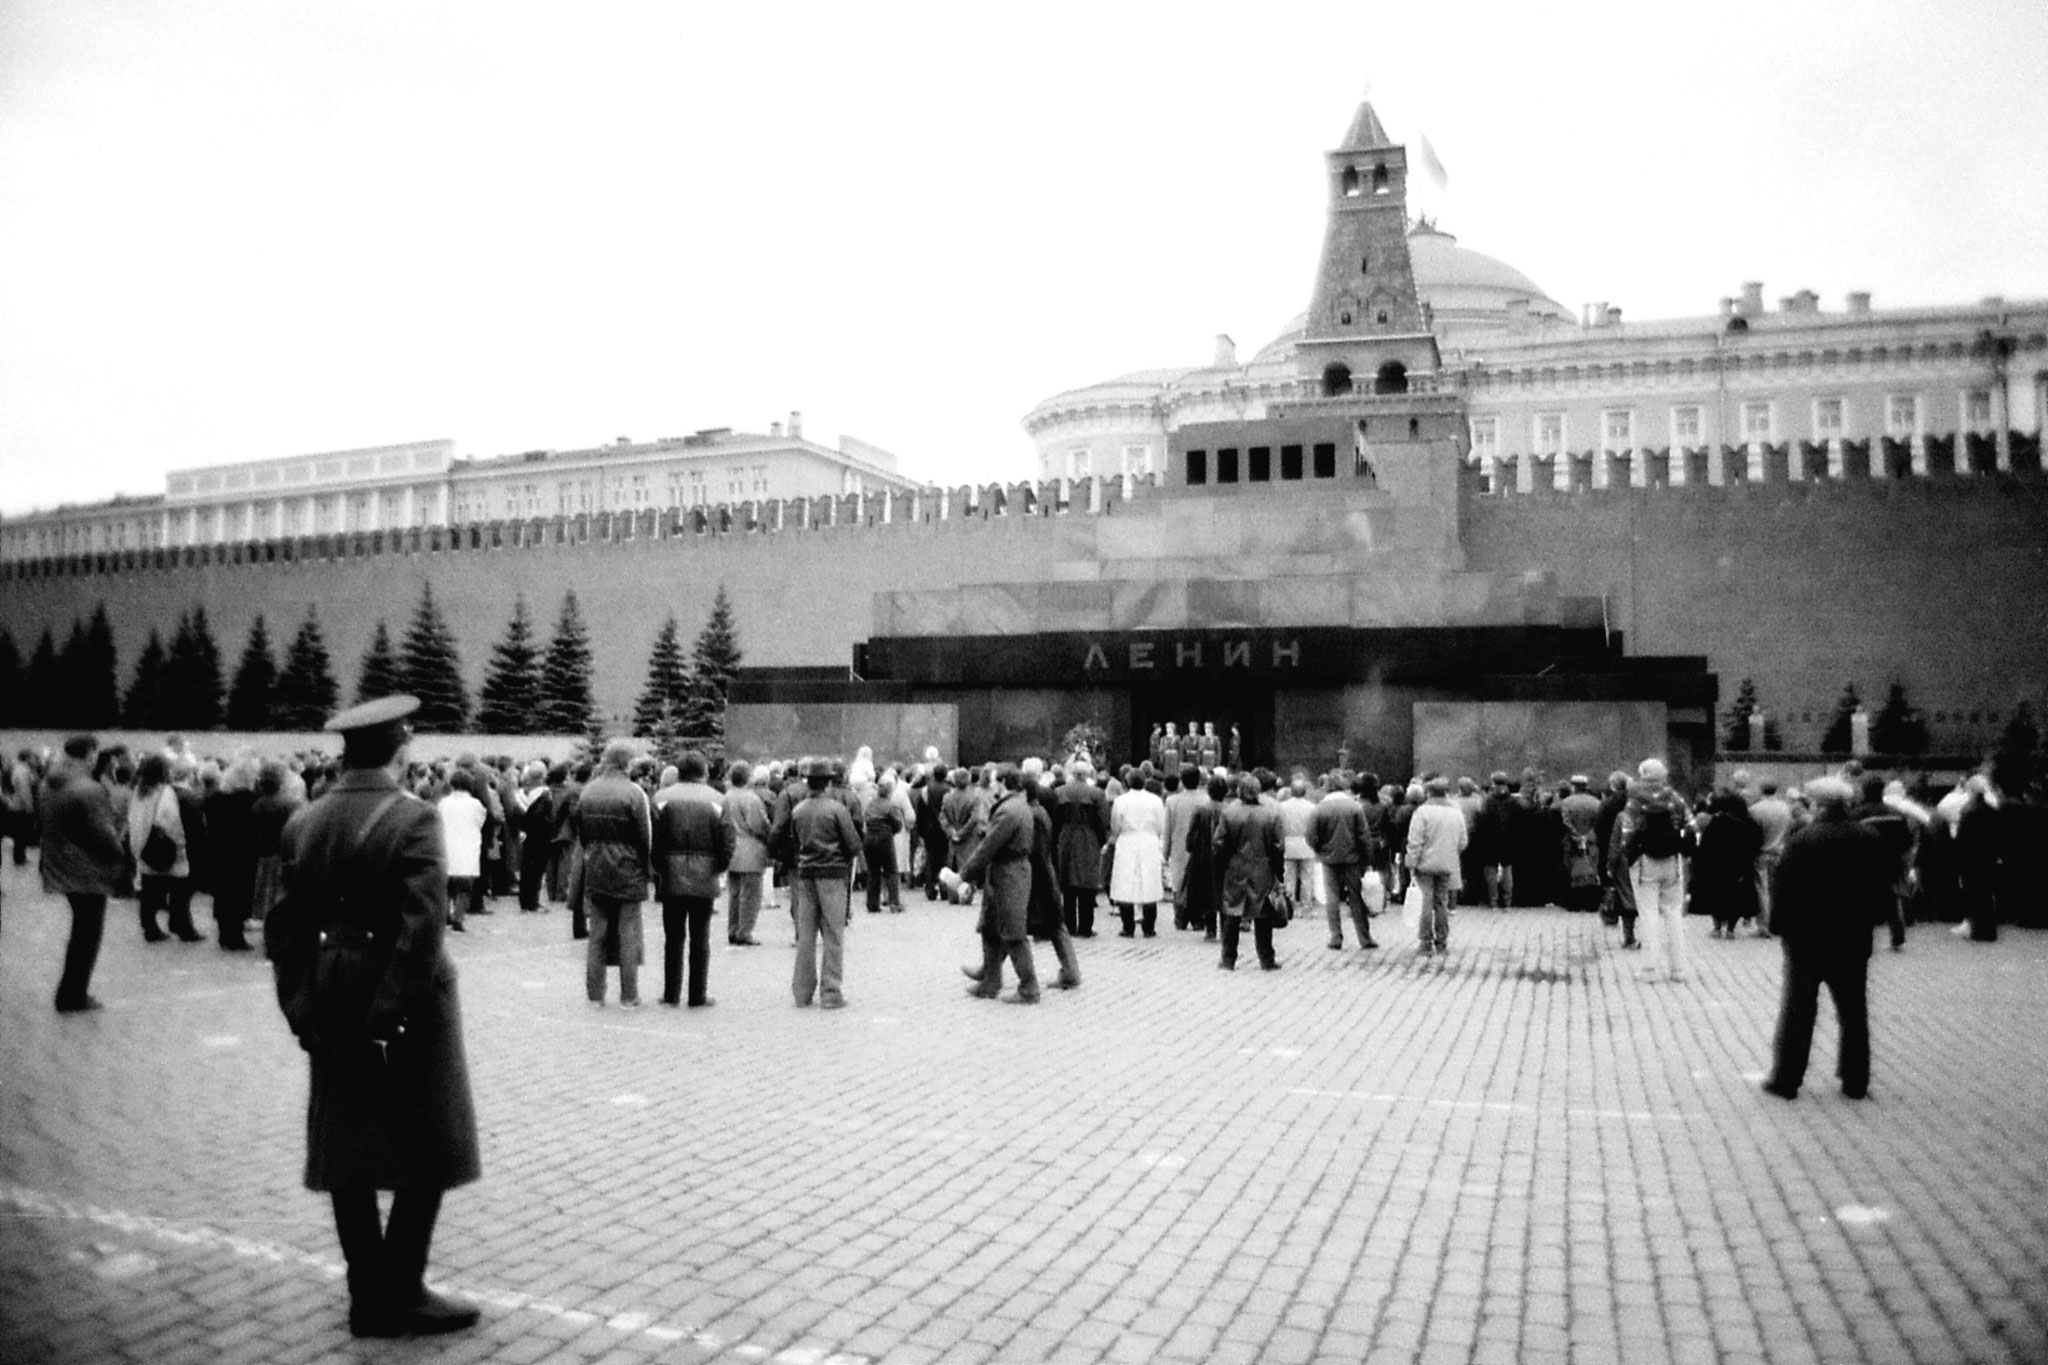 17/10/1988: 1: Lenin tomb - 3pm changing guard